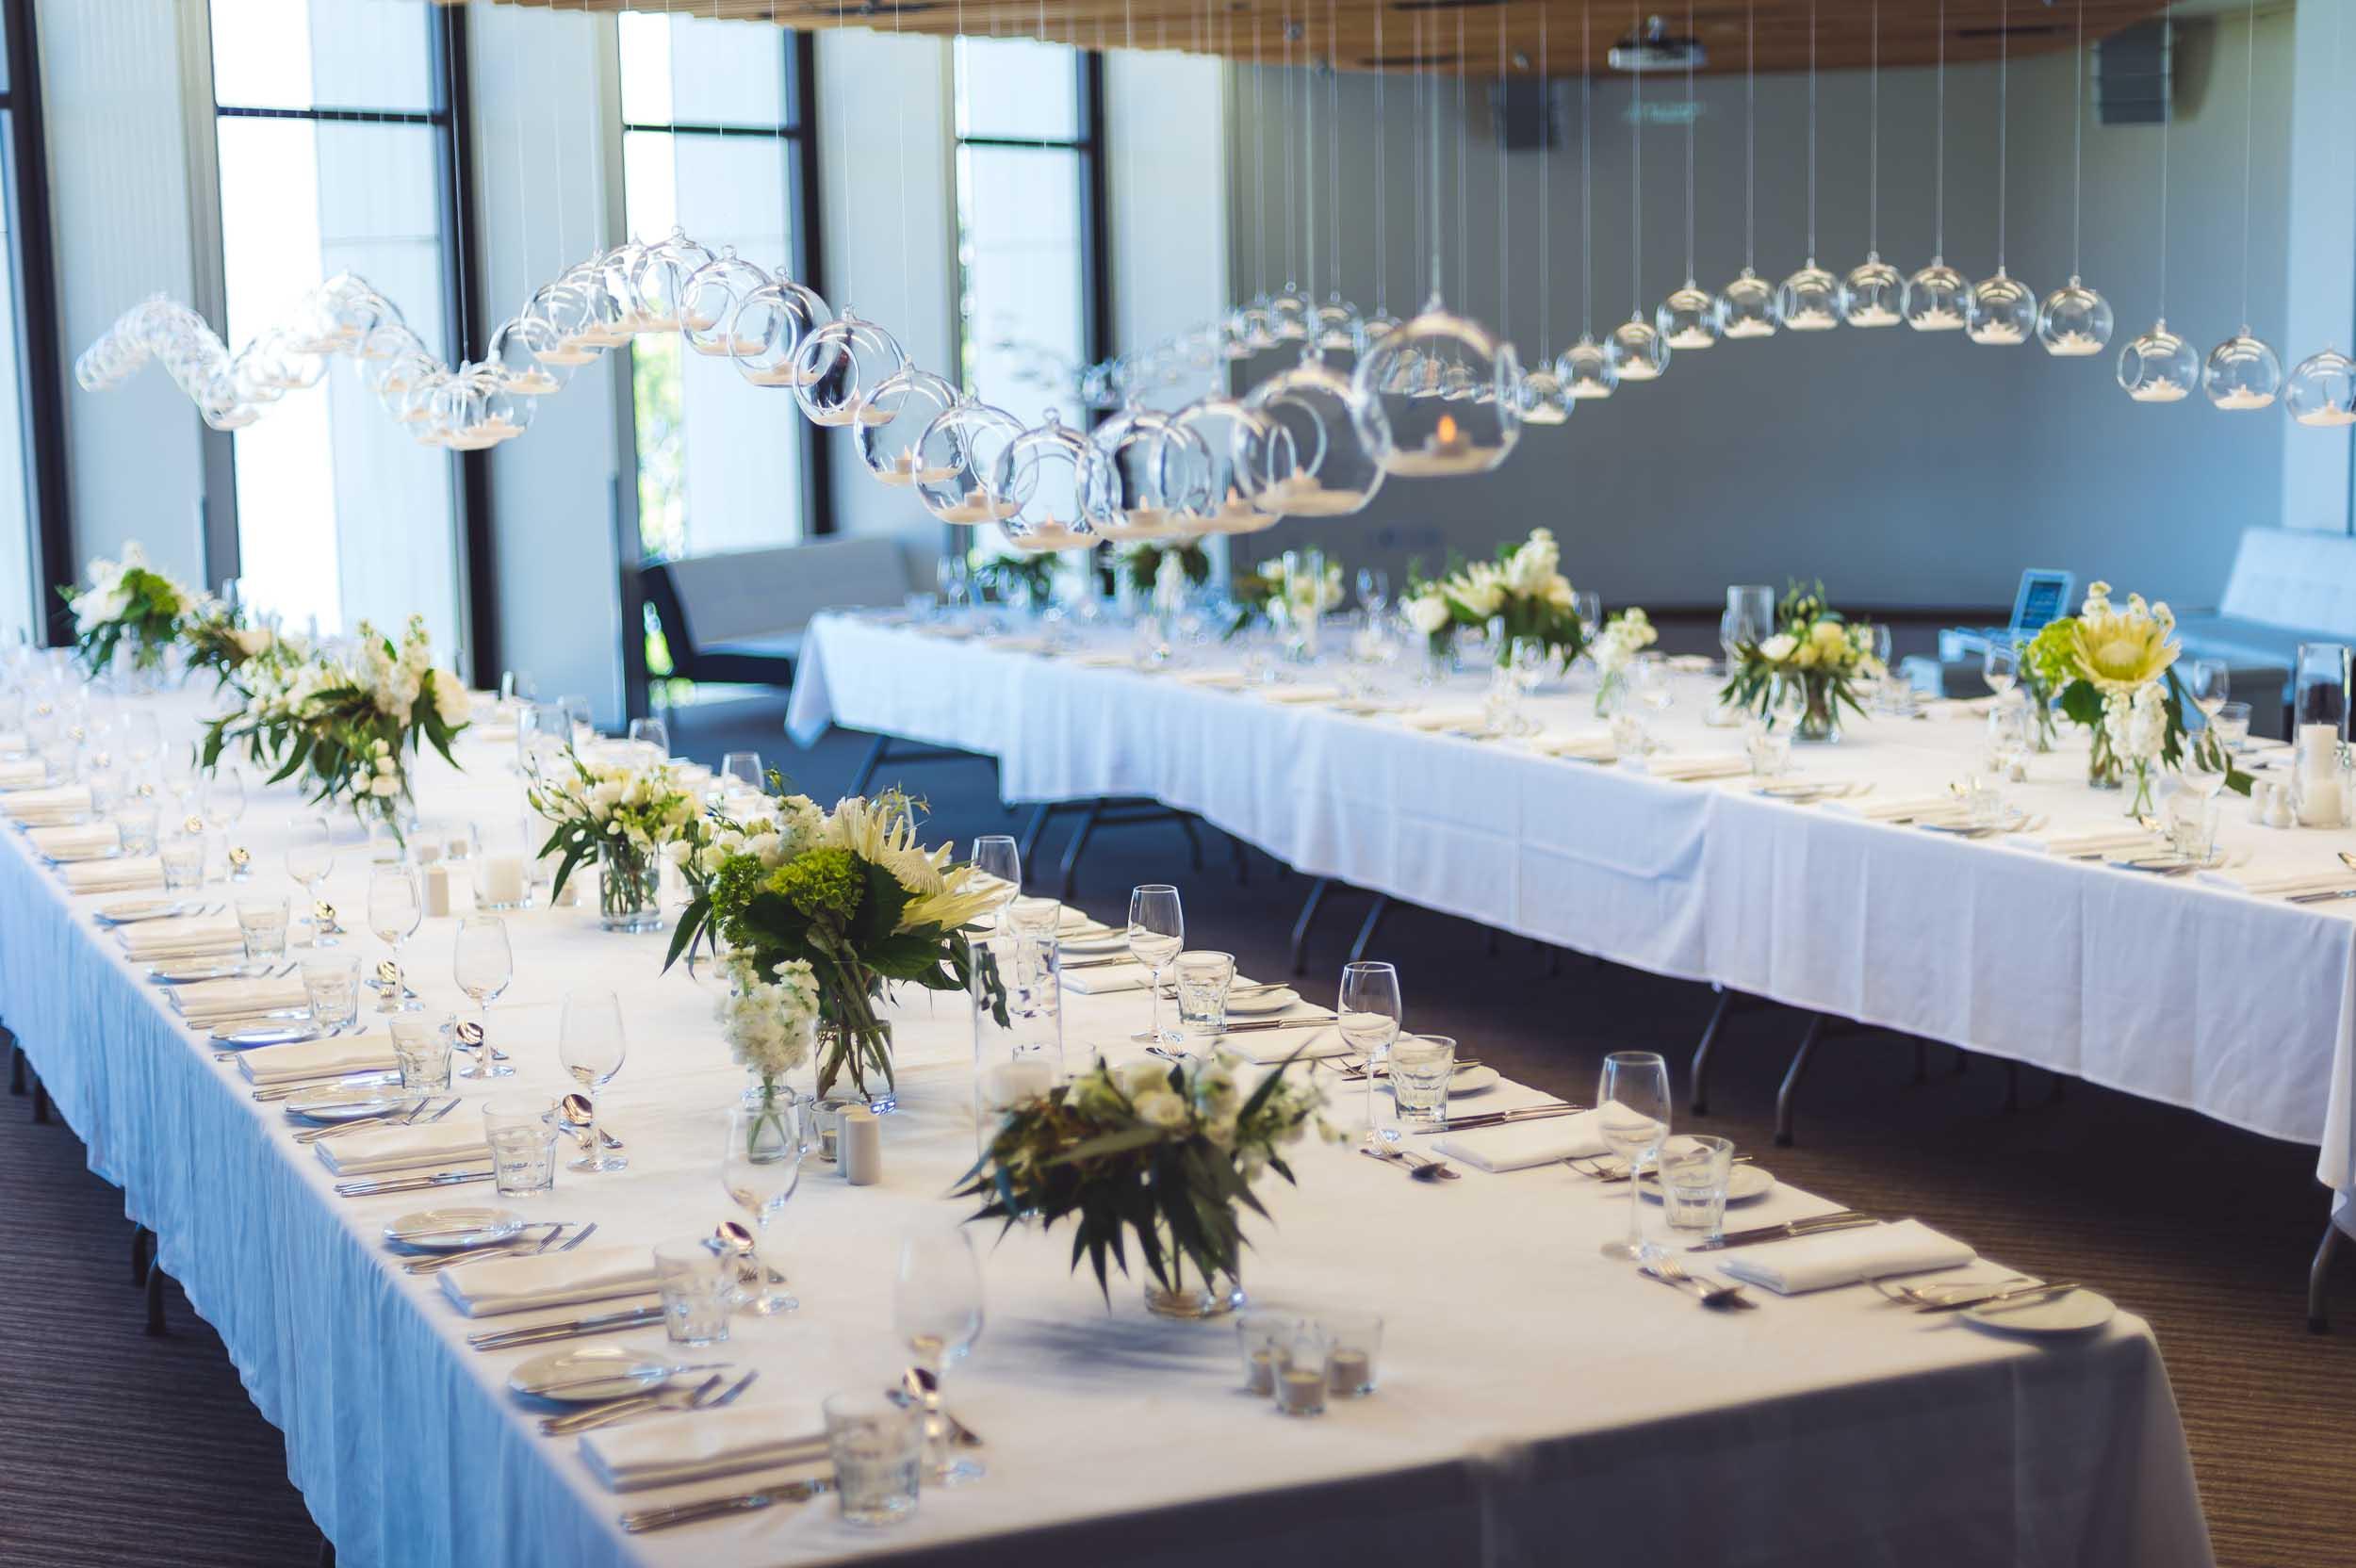 heritage hotel wedding reception table setup